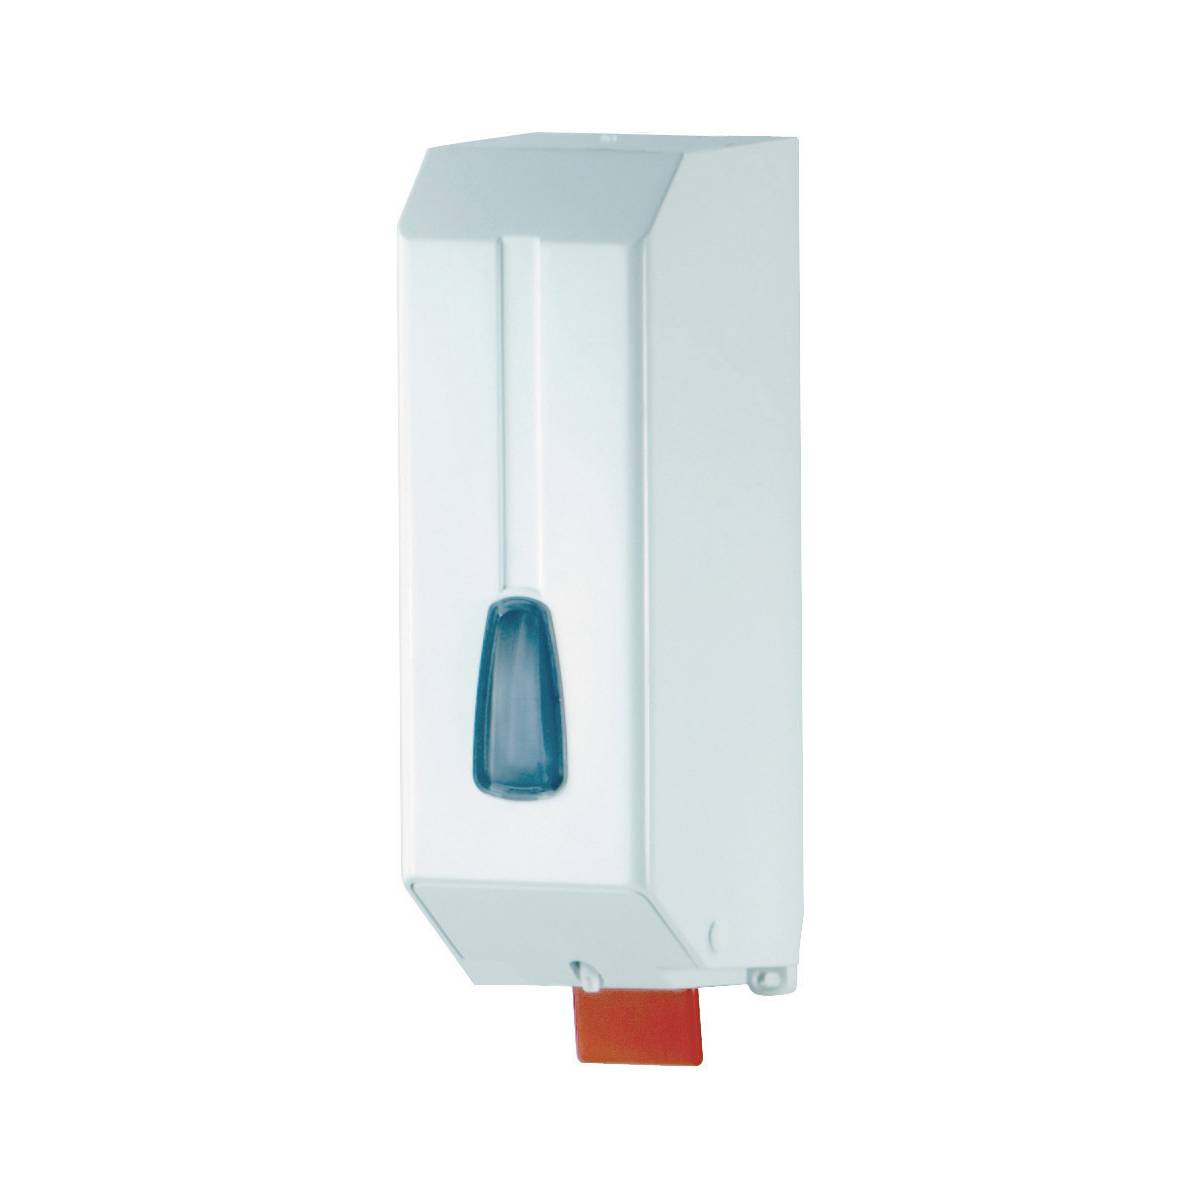 Дозатор жидкого мыла Mar Plast (542 INOX W) A5421AP Mar Plast